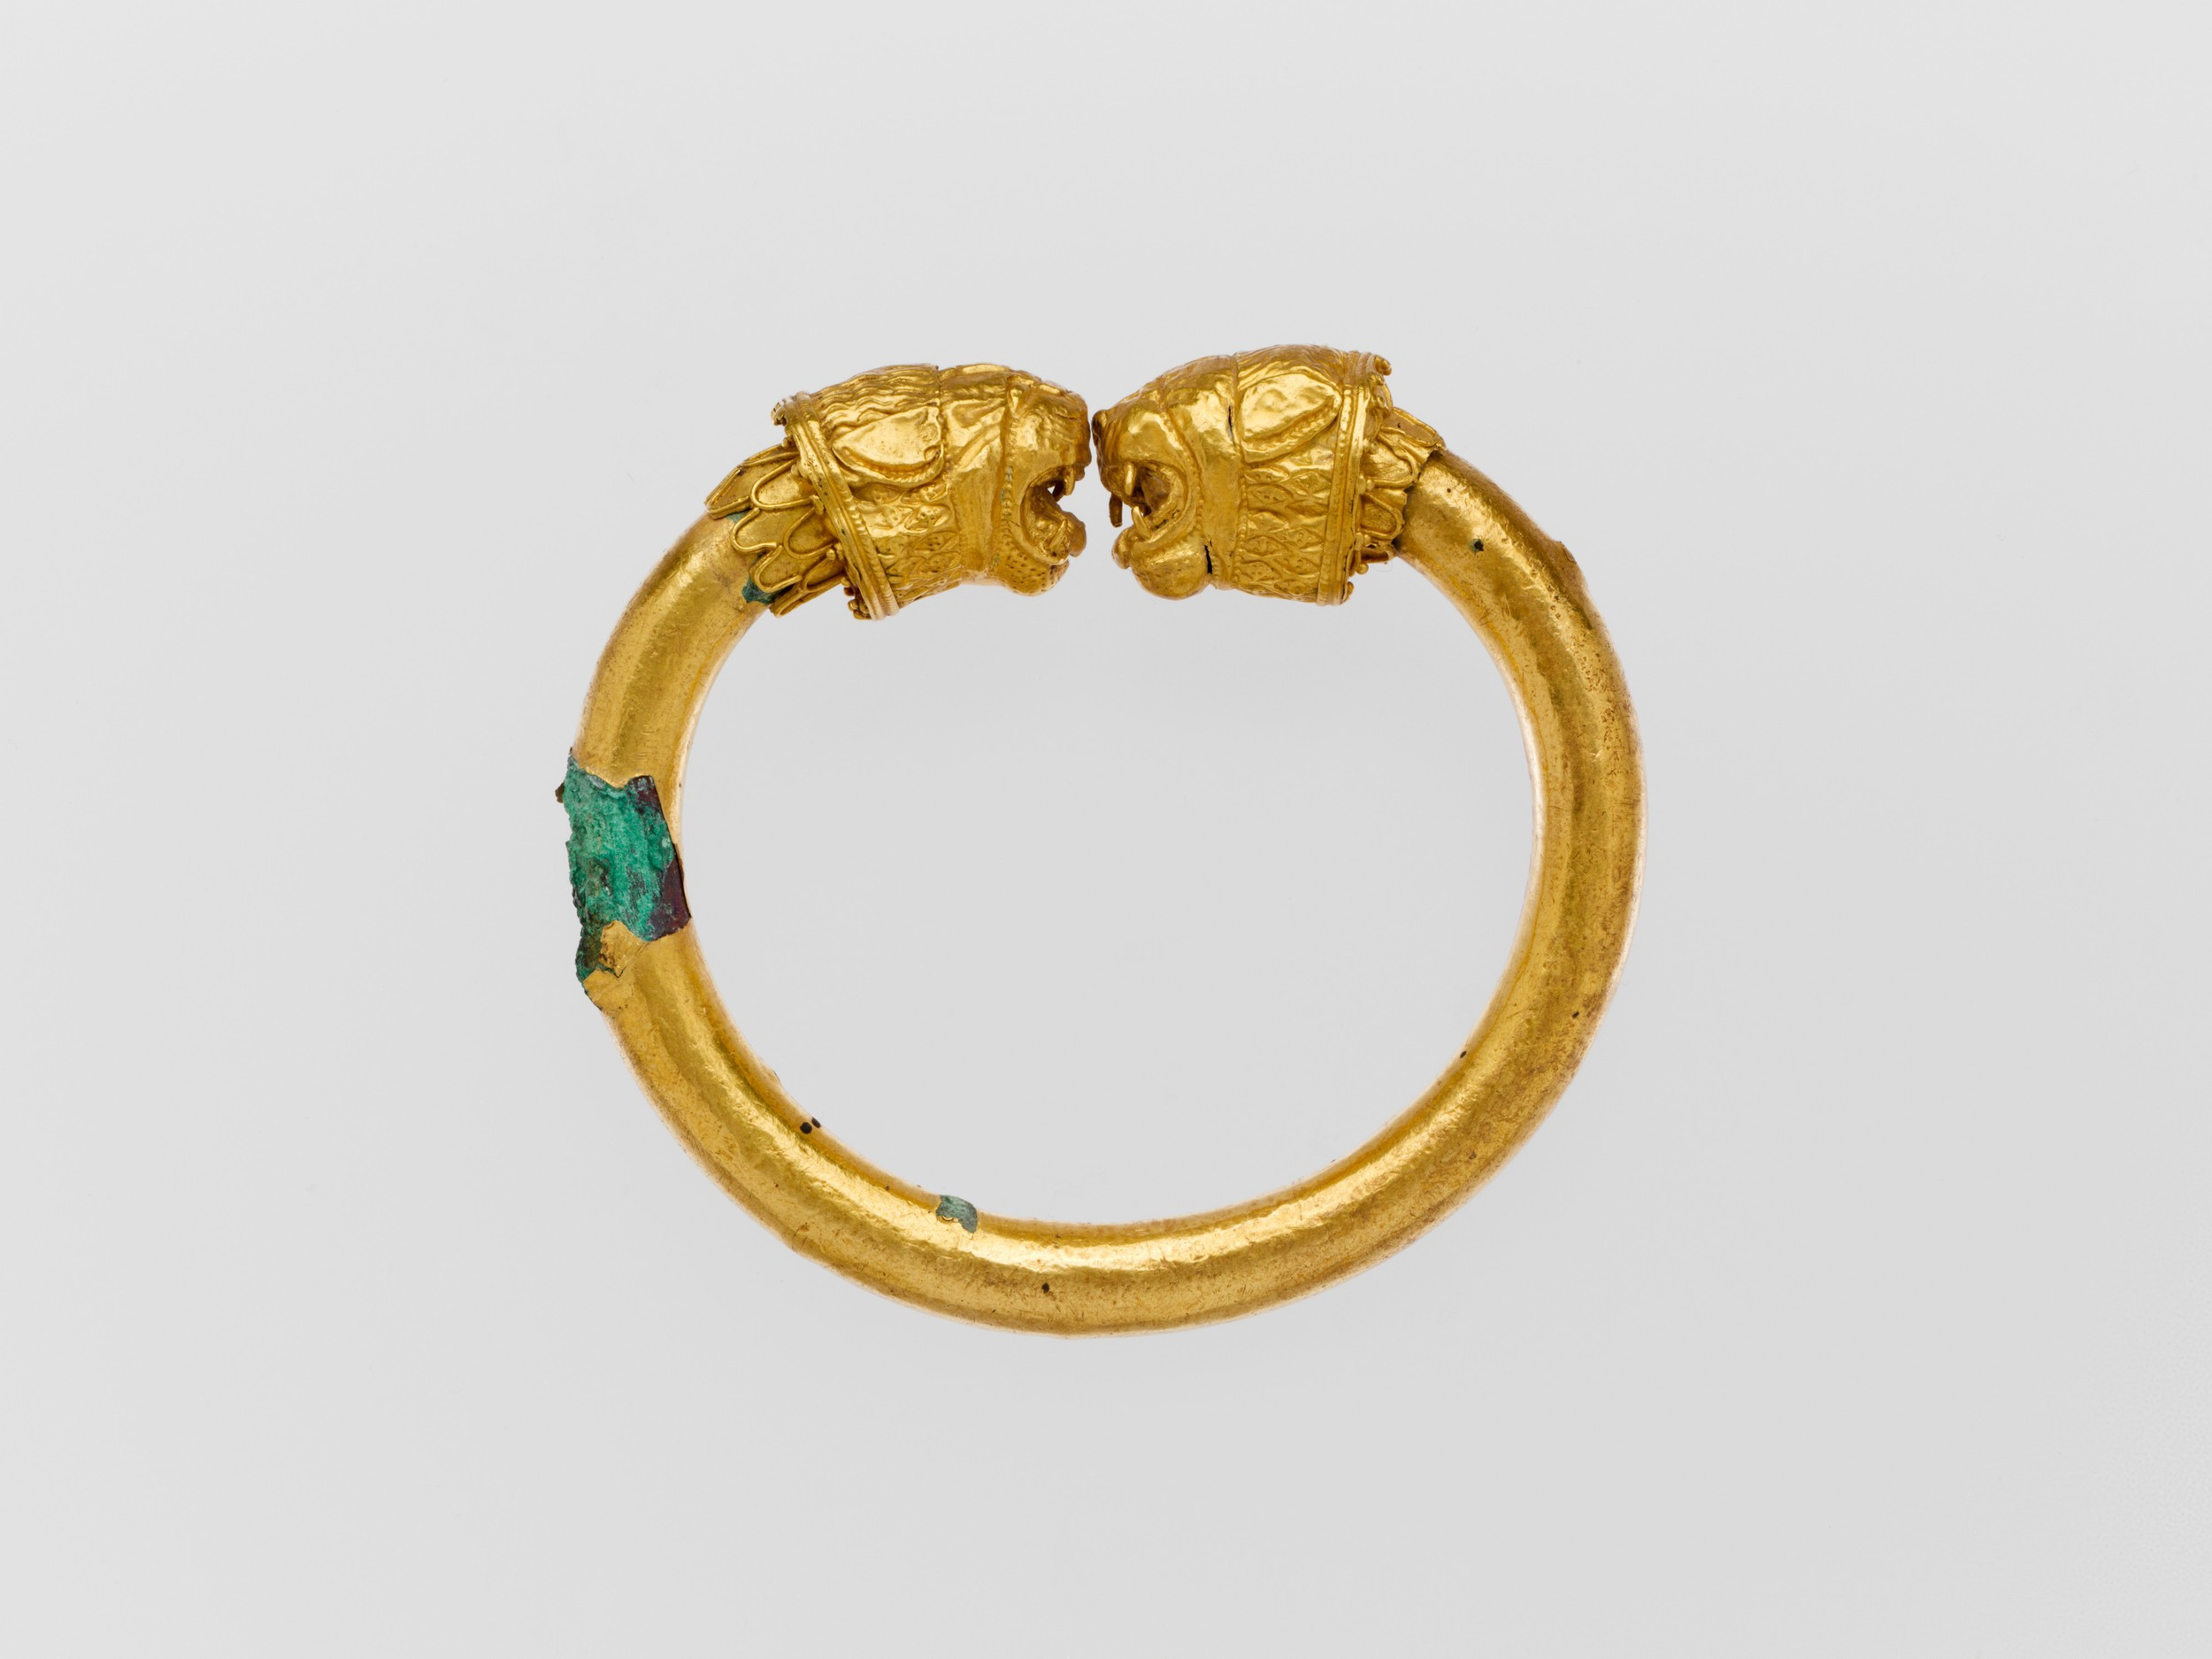 Gold & Copper Alloy Bracelet w/ Lion-Head Finials. Cypriot, 5th Century BC. Metropolitan Museum of Art, 74.51.3559.